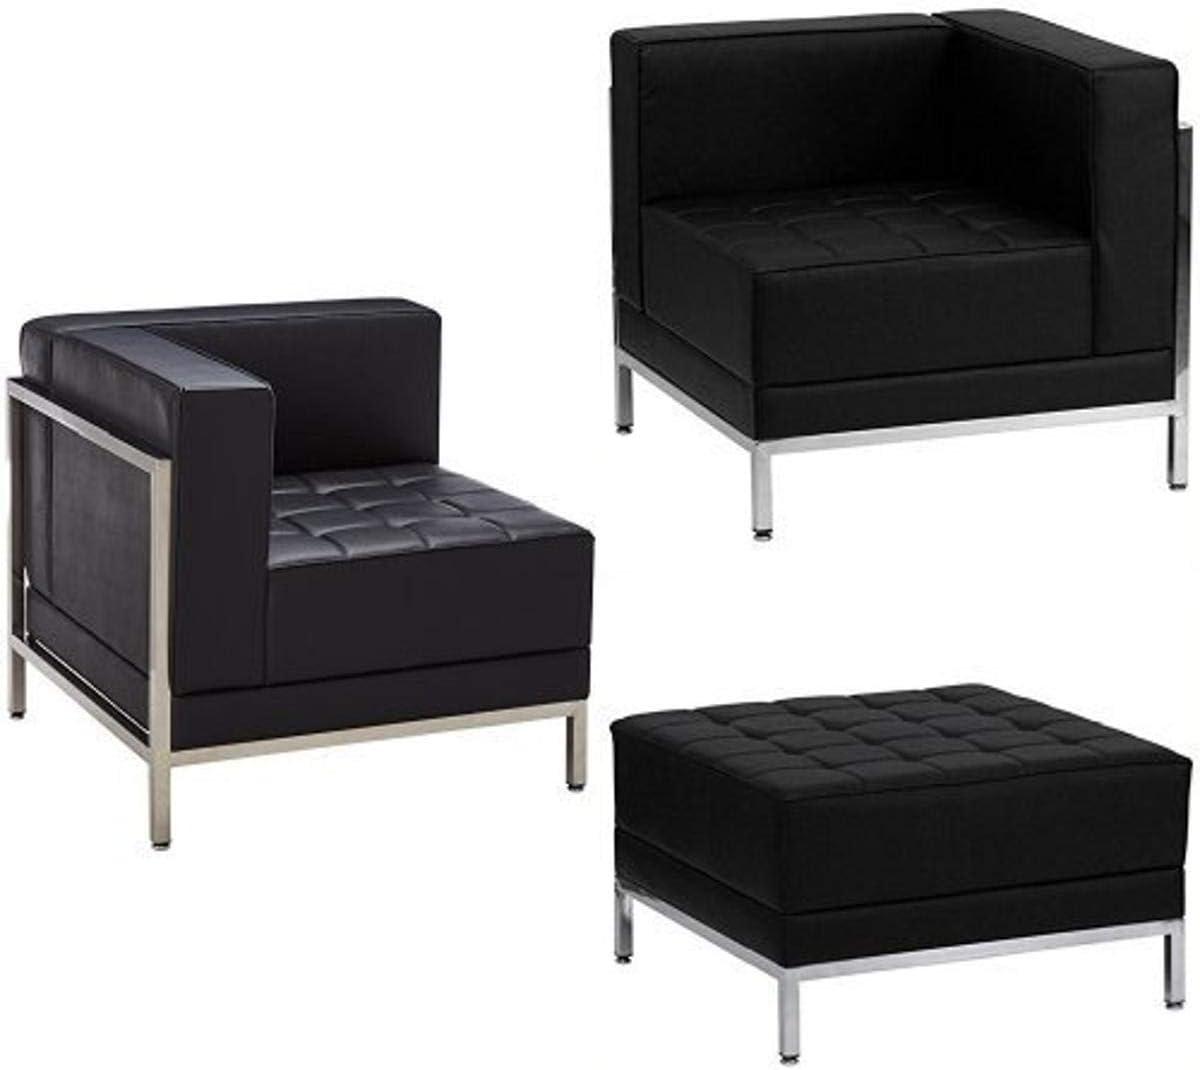 Flash Furniture HERCULES Imagination Series Black Leather 4 Piece Chair & Ottoman Set